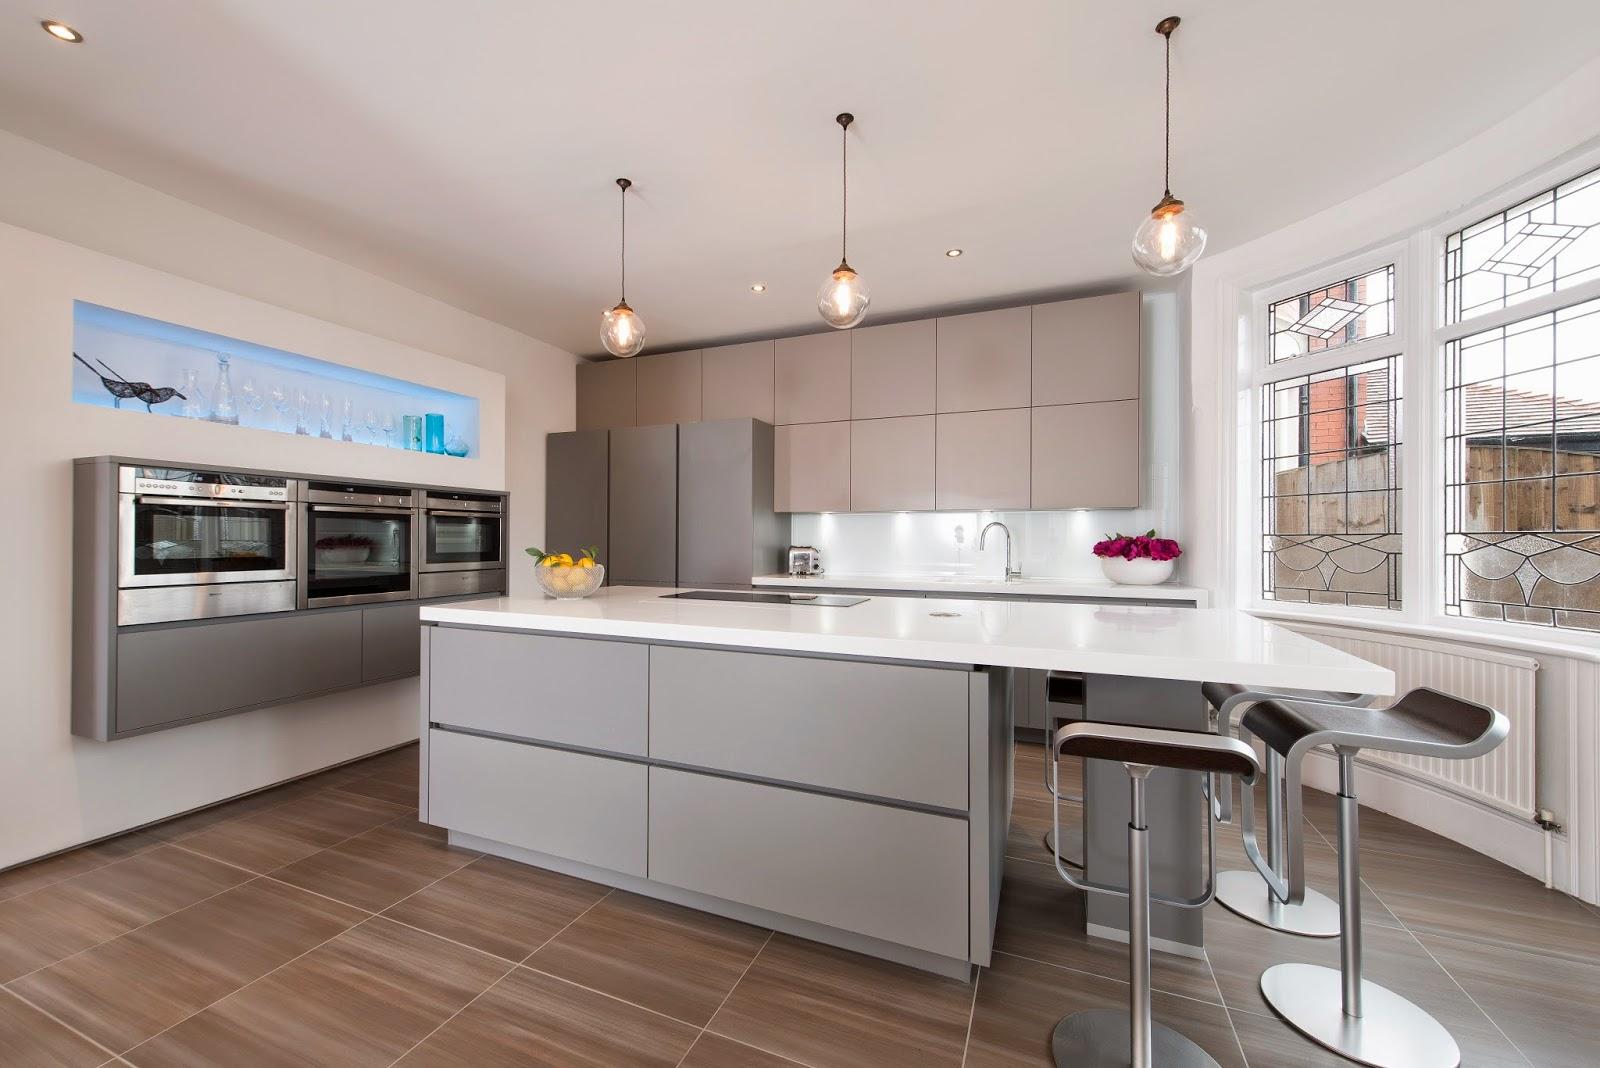 diane berry kitchens client kitchens. Black Bedroom Furniture Sets. Home Design Ideas